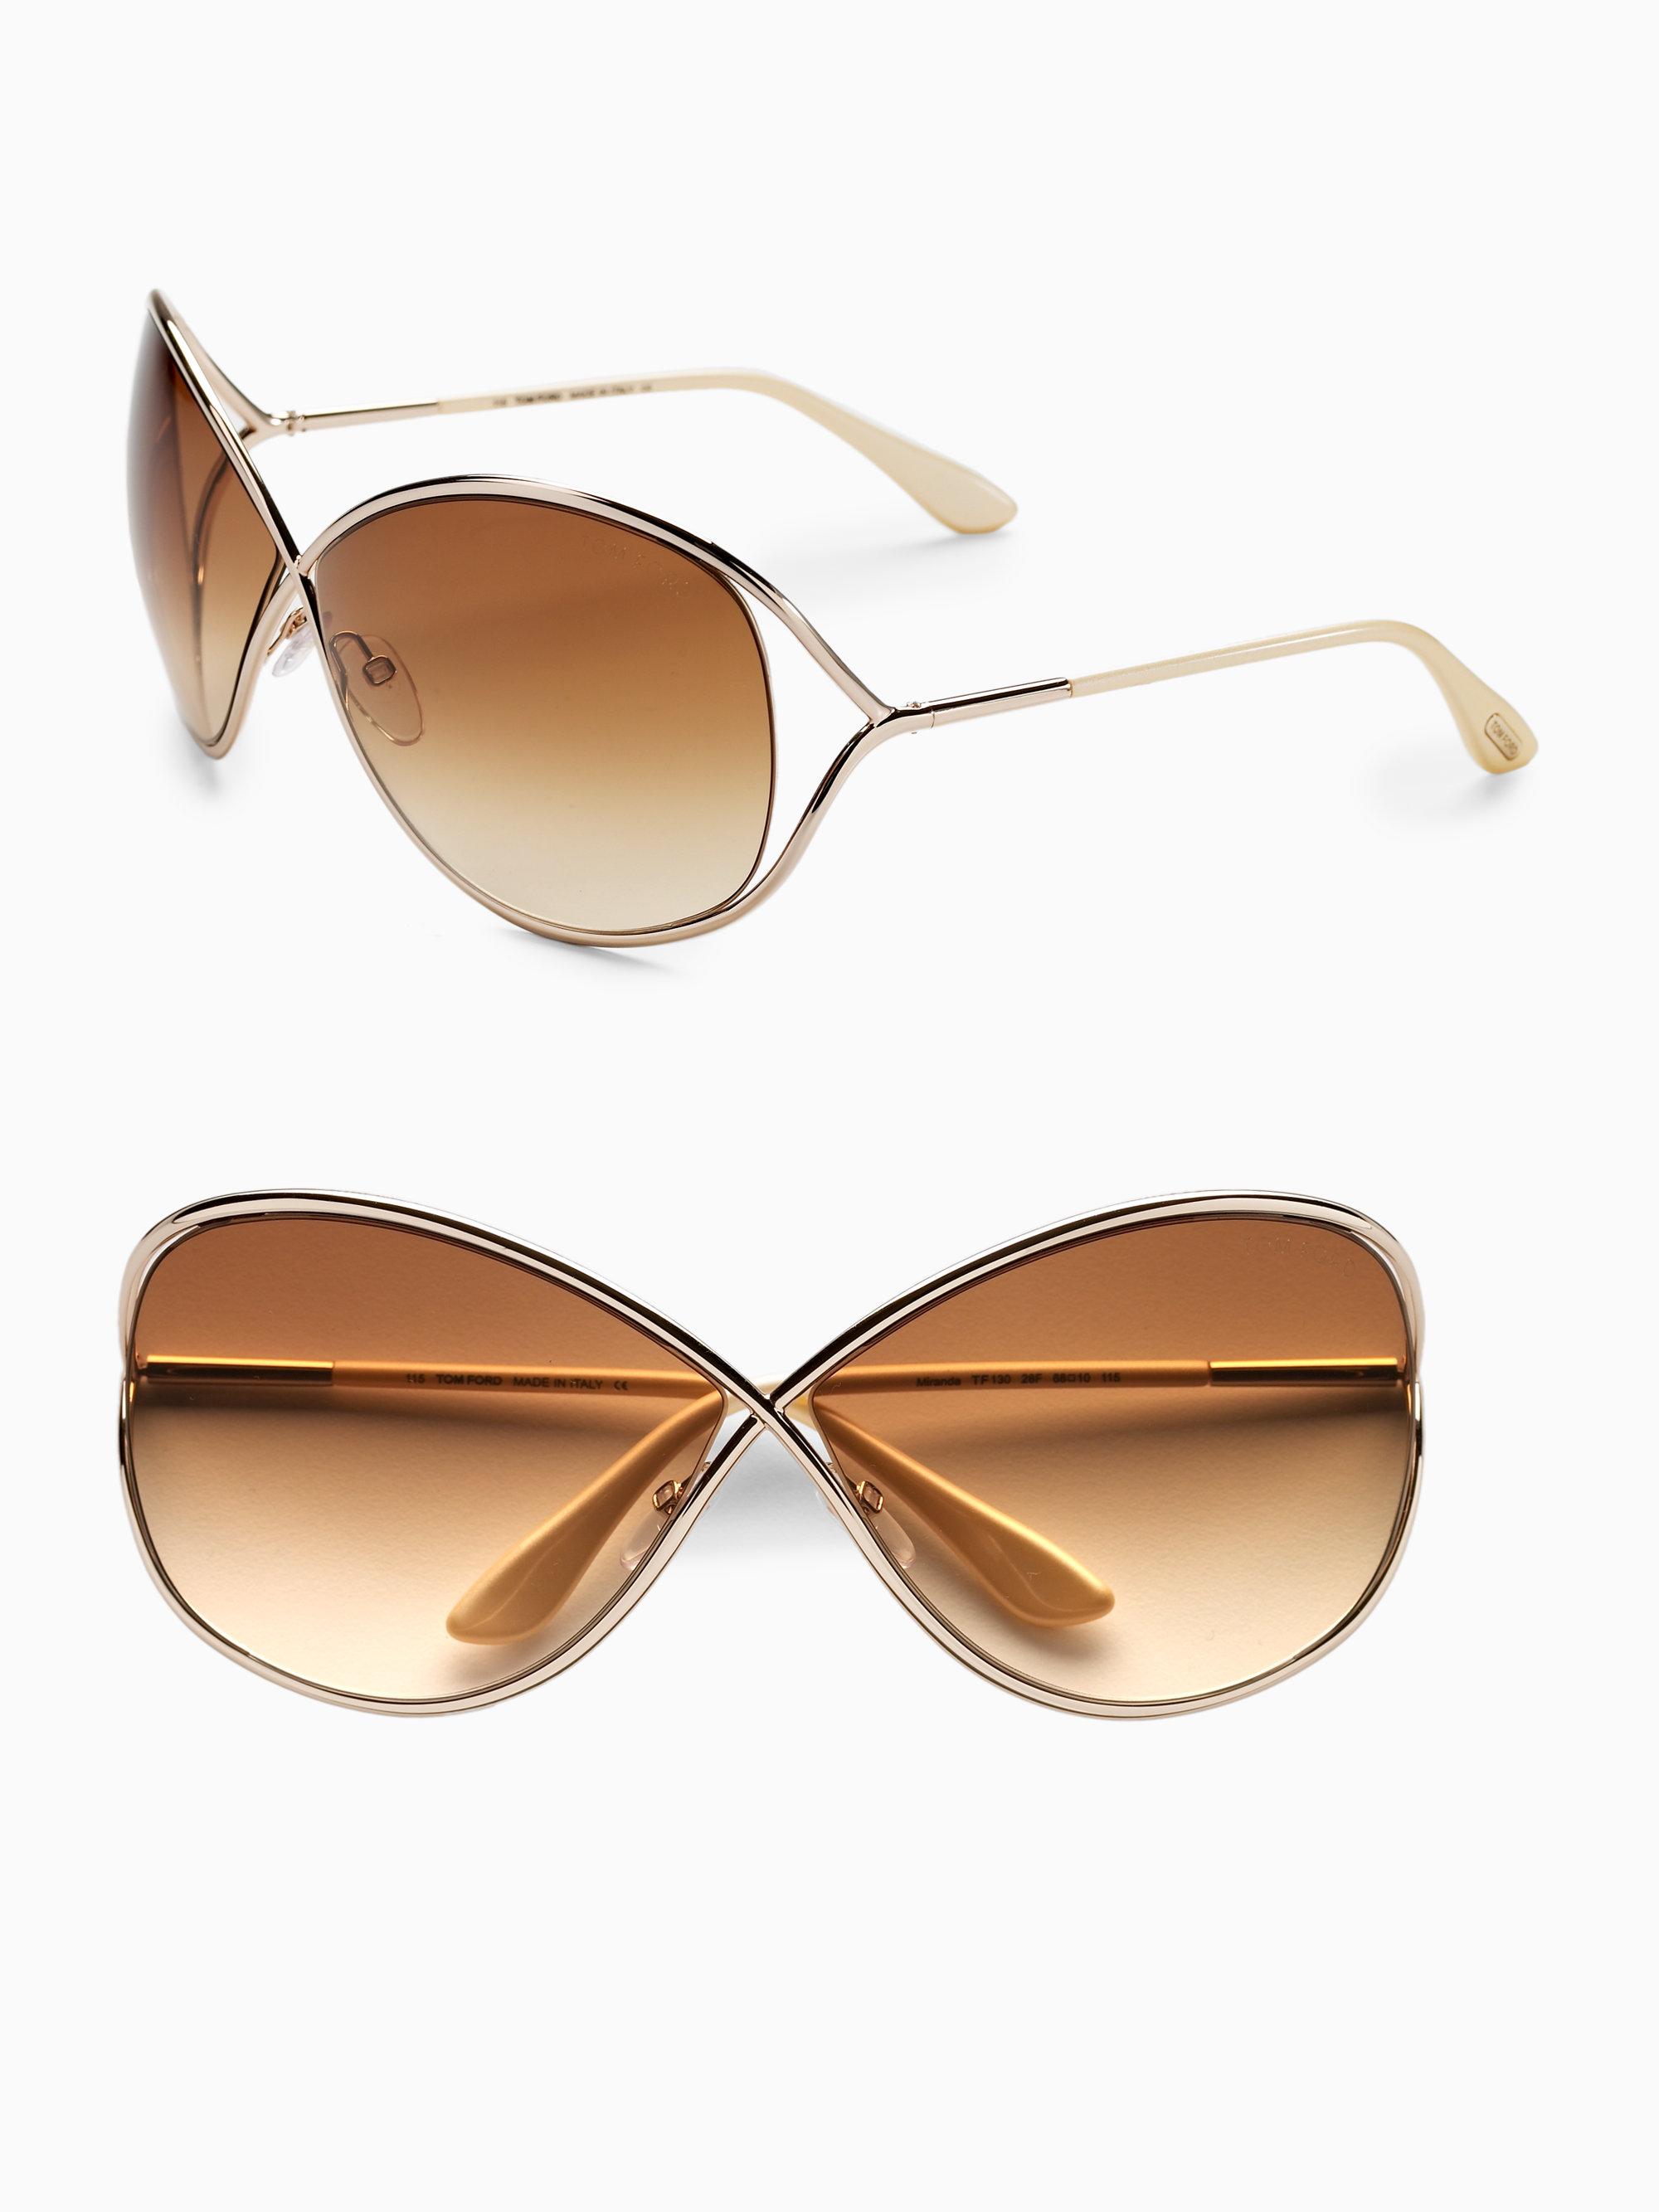 a71b8d4db9c Tom ford Miranda Oversized Round Sunglasses in Metallic